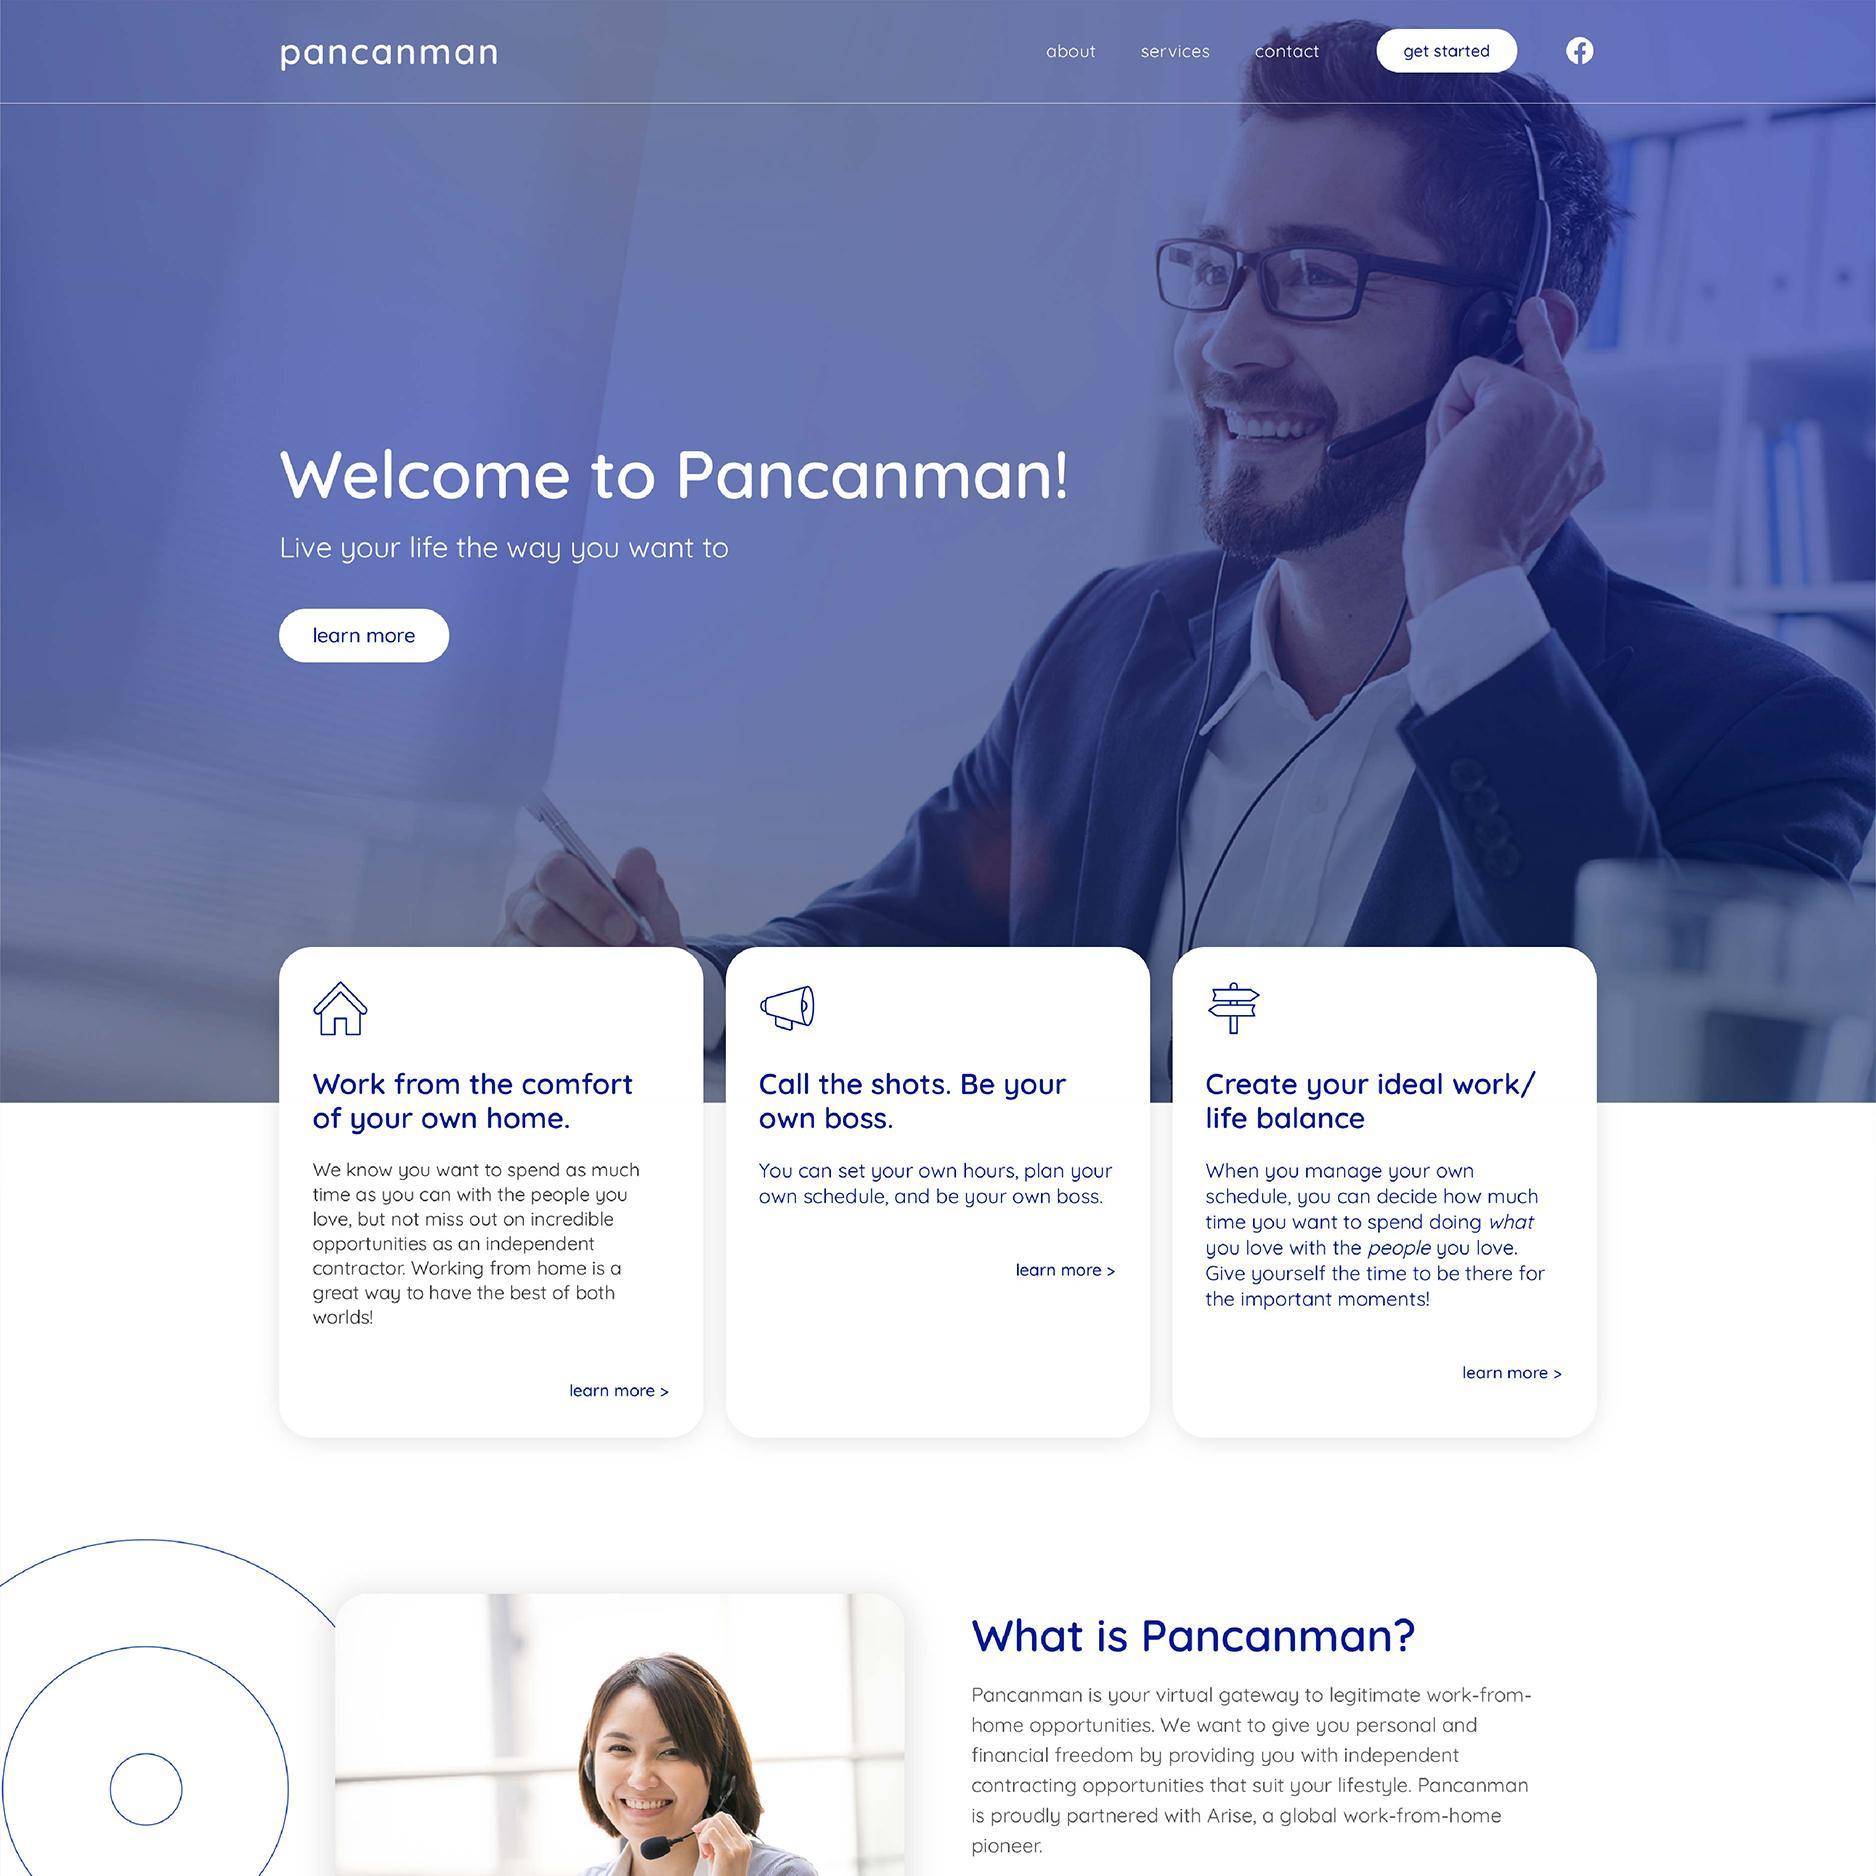 verdant-creative-portfolio-web-design-pancanman-01